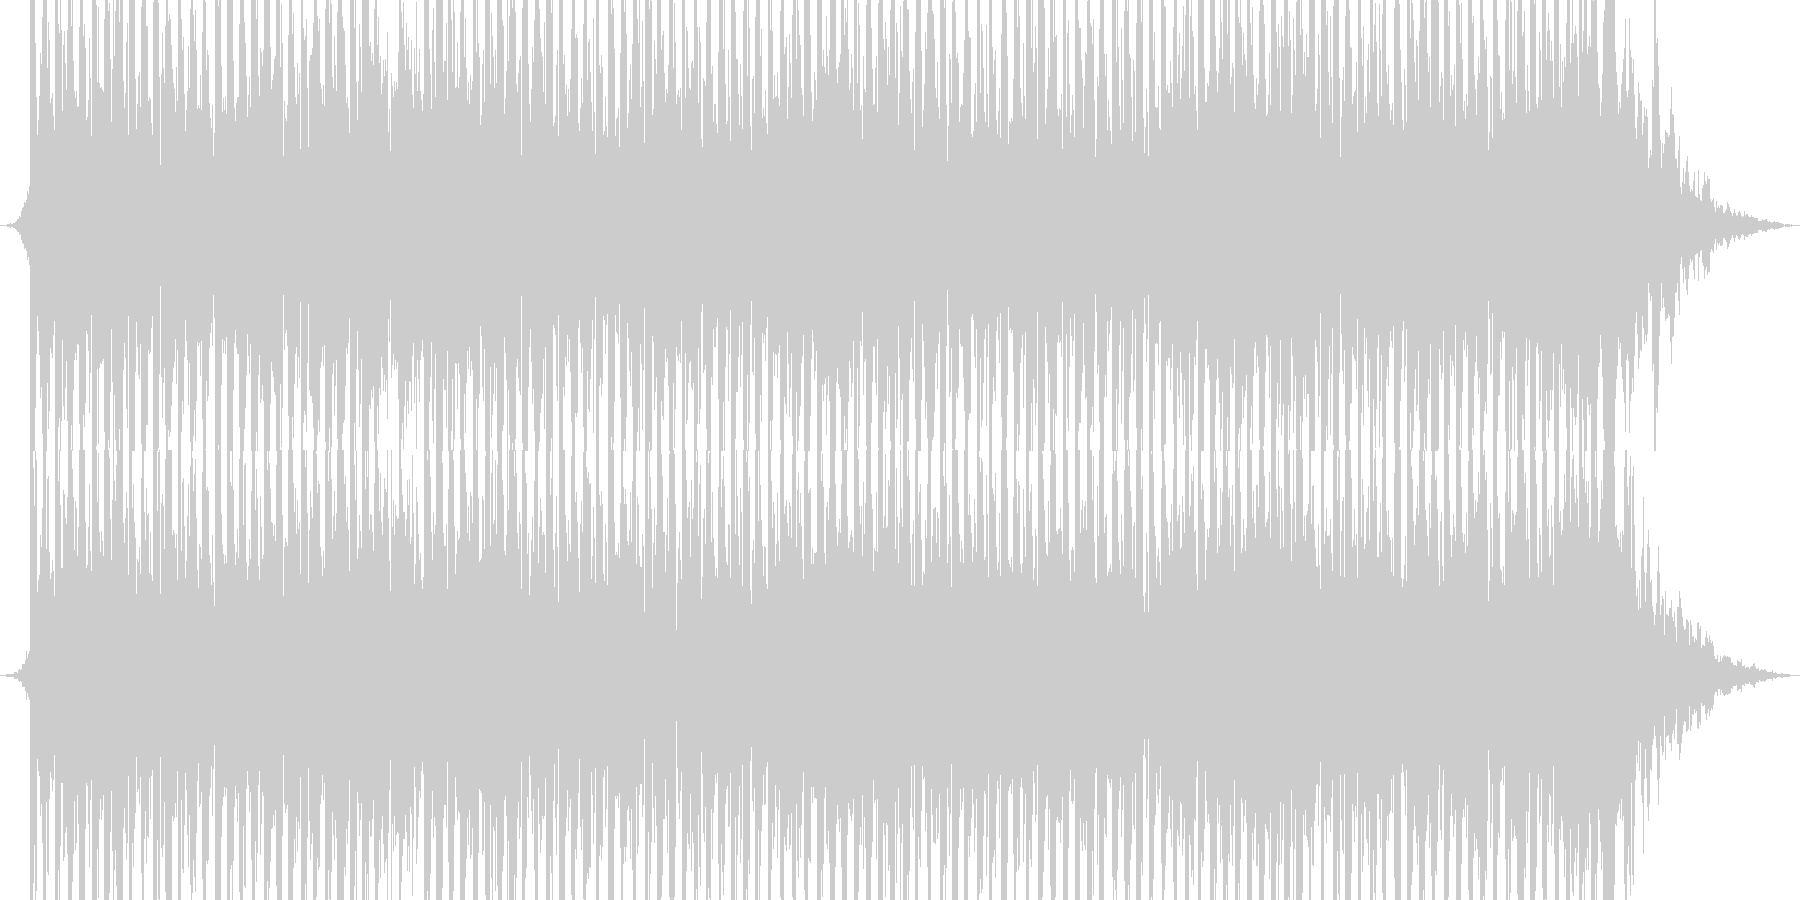 No main sound / Fighting spirit x Sexy EDM_ Flashy's unreproduced waveform